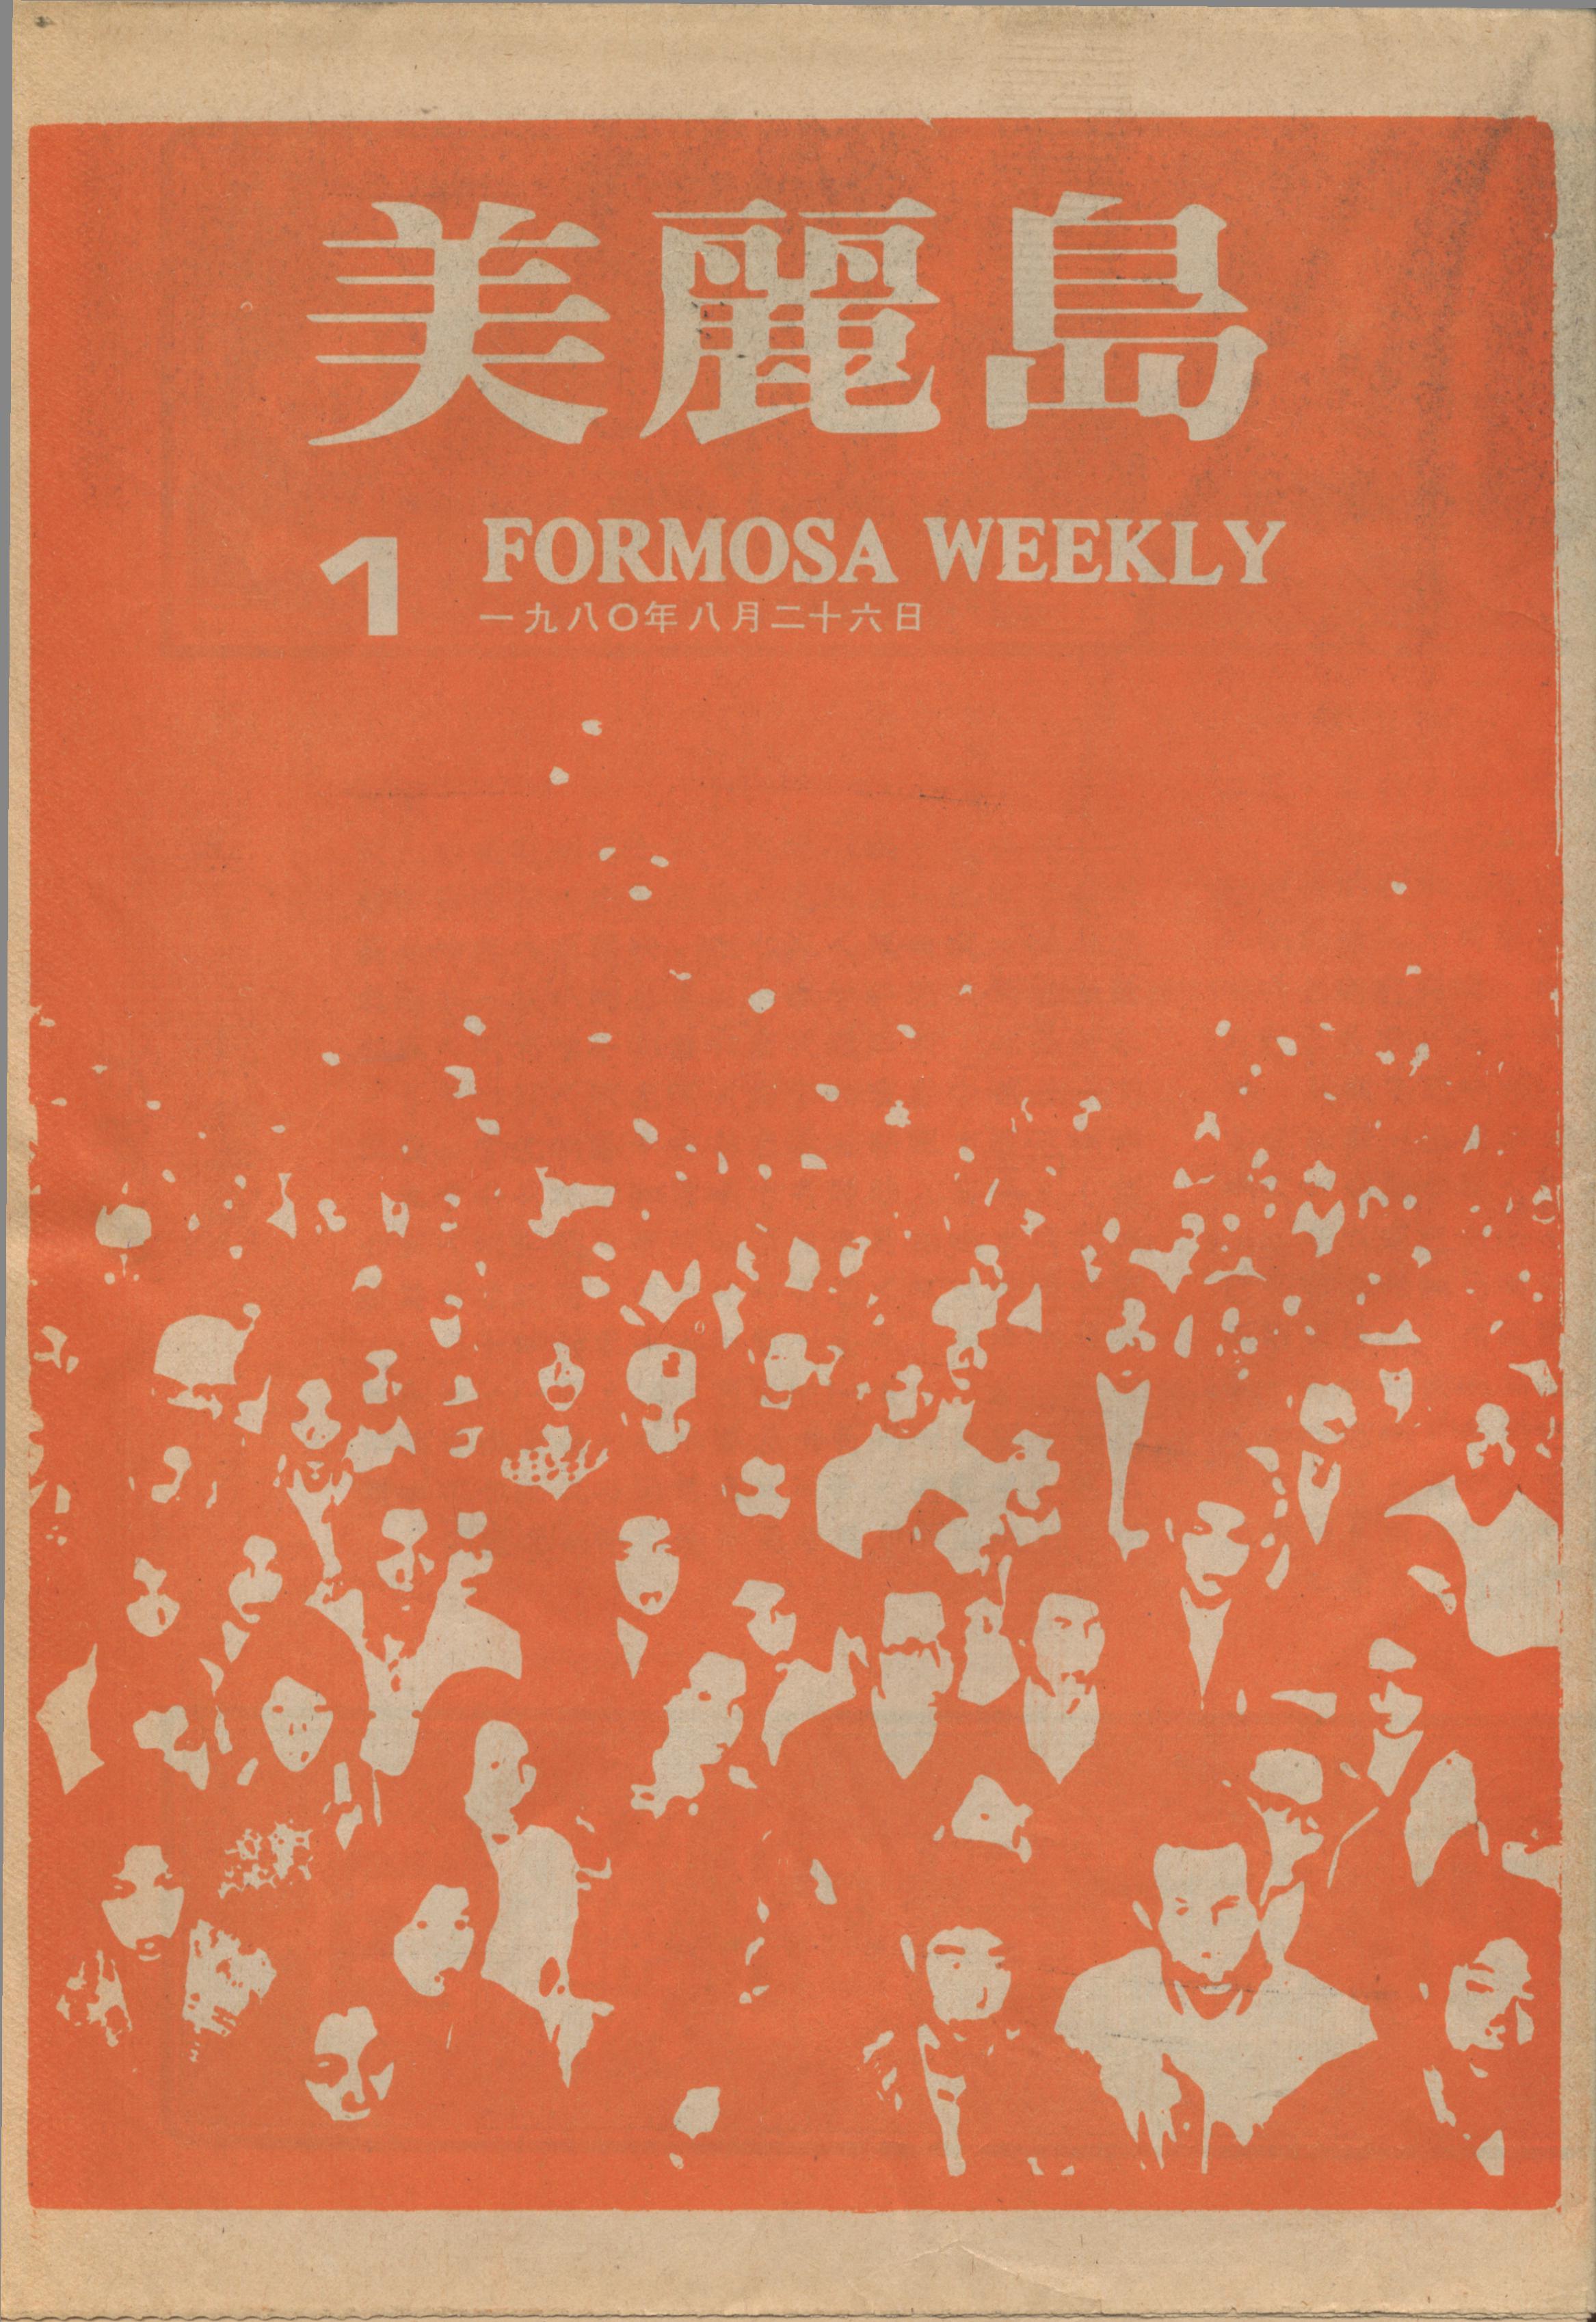 Formosa Weekly 美麗島週刊